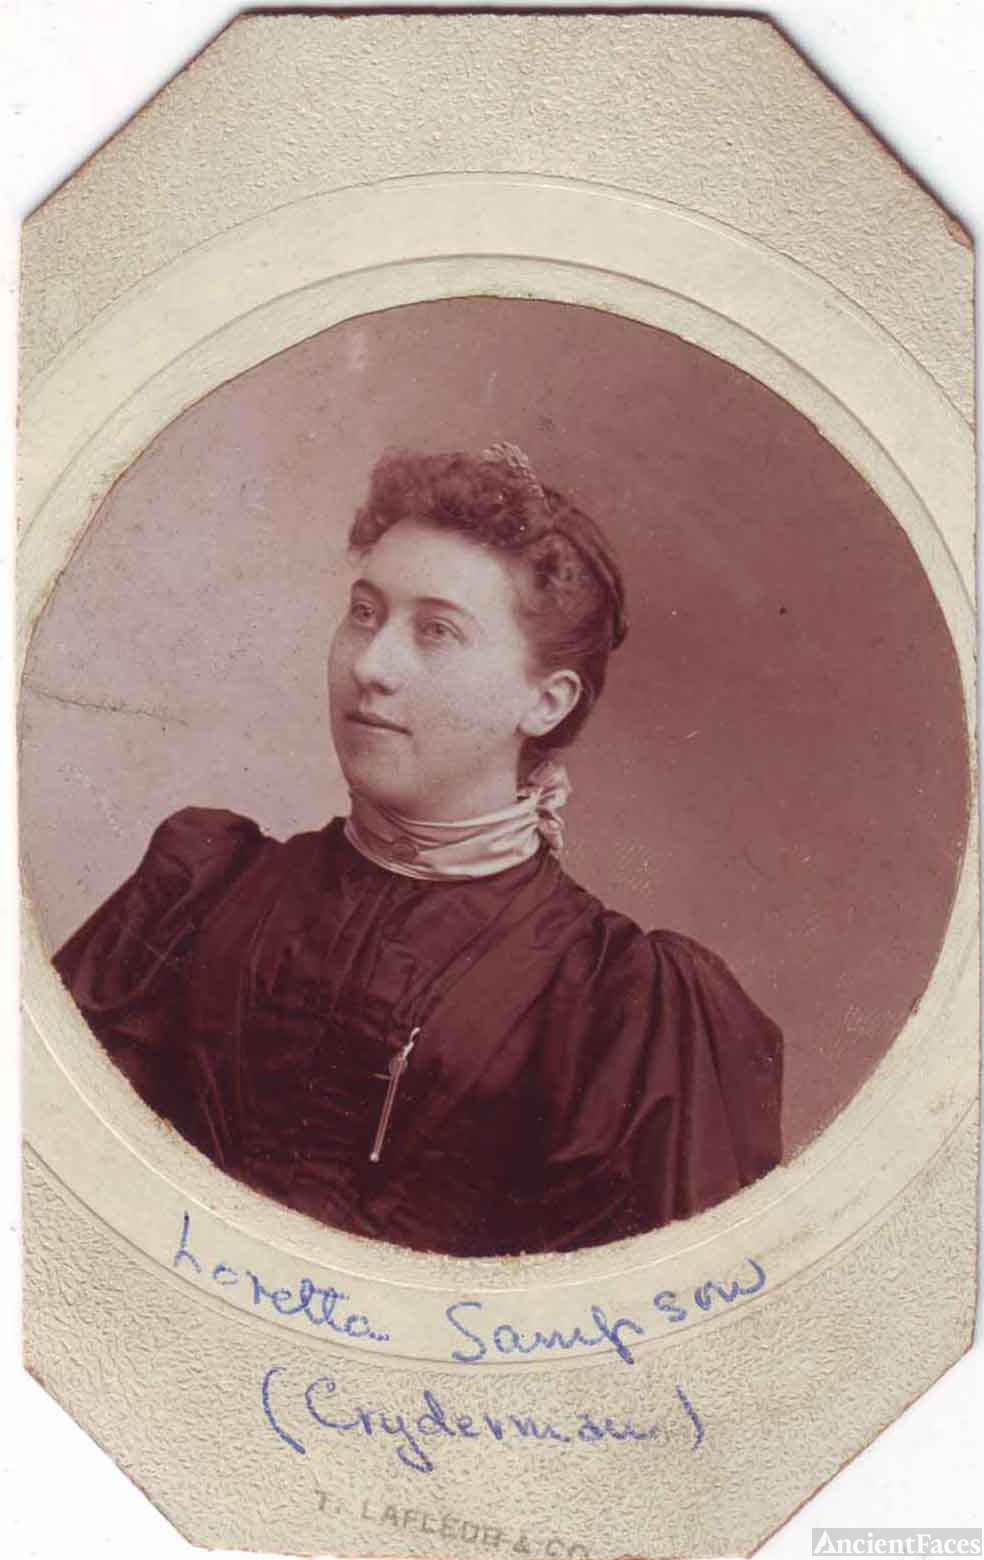 Agnes Loretta Cryderman (nee Sampson)